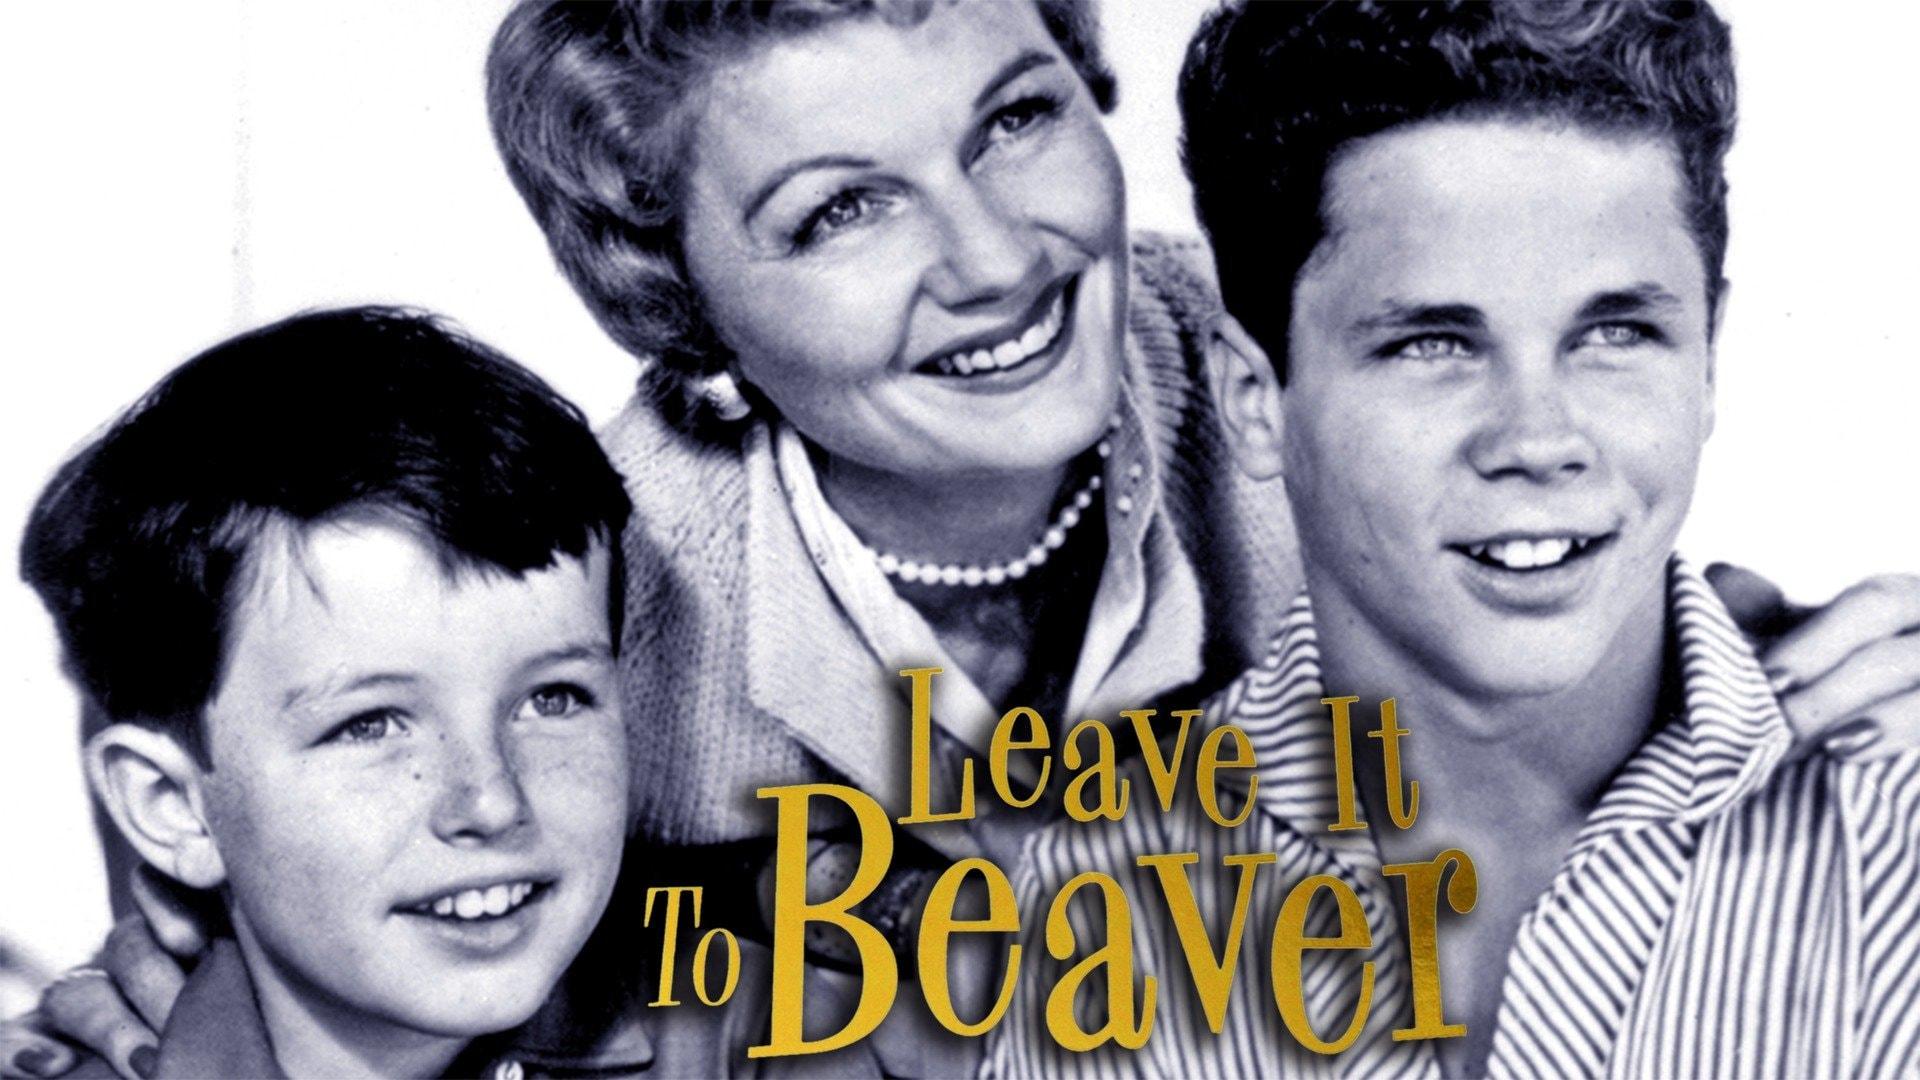 Beaver's Rat